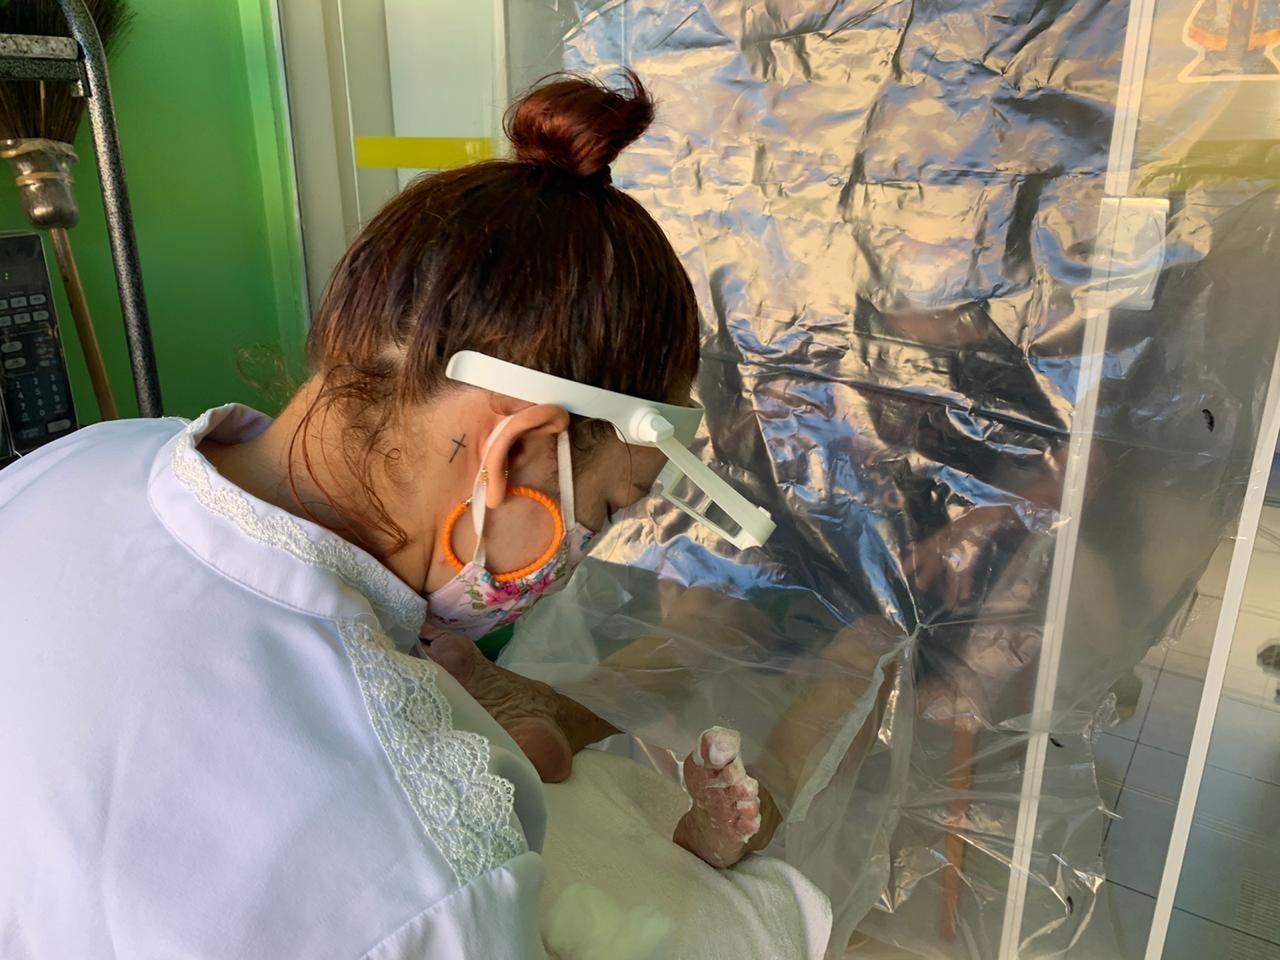 Dentista cria 'escudo de lona' para avó de 85 anos receber atendimento da podóloga no Acre